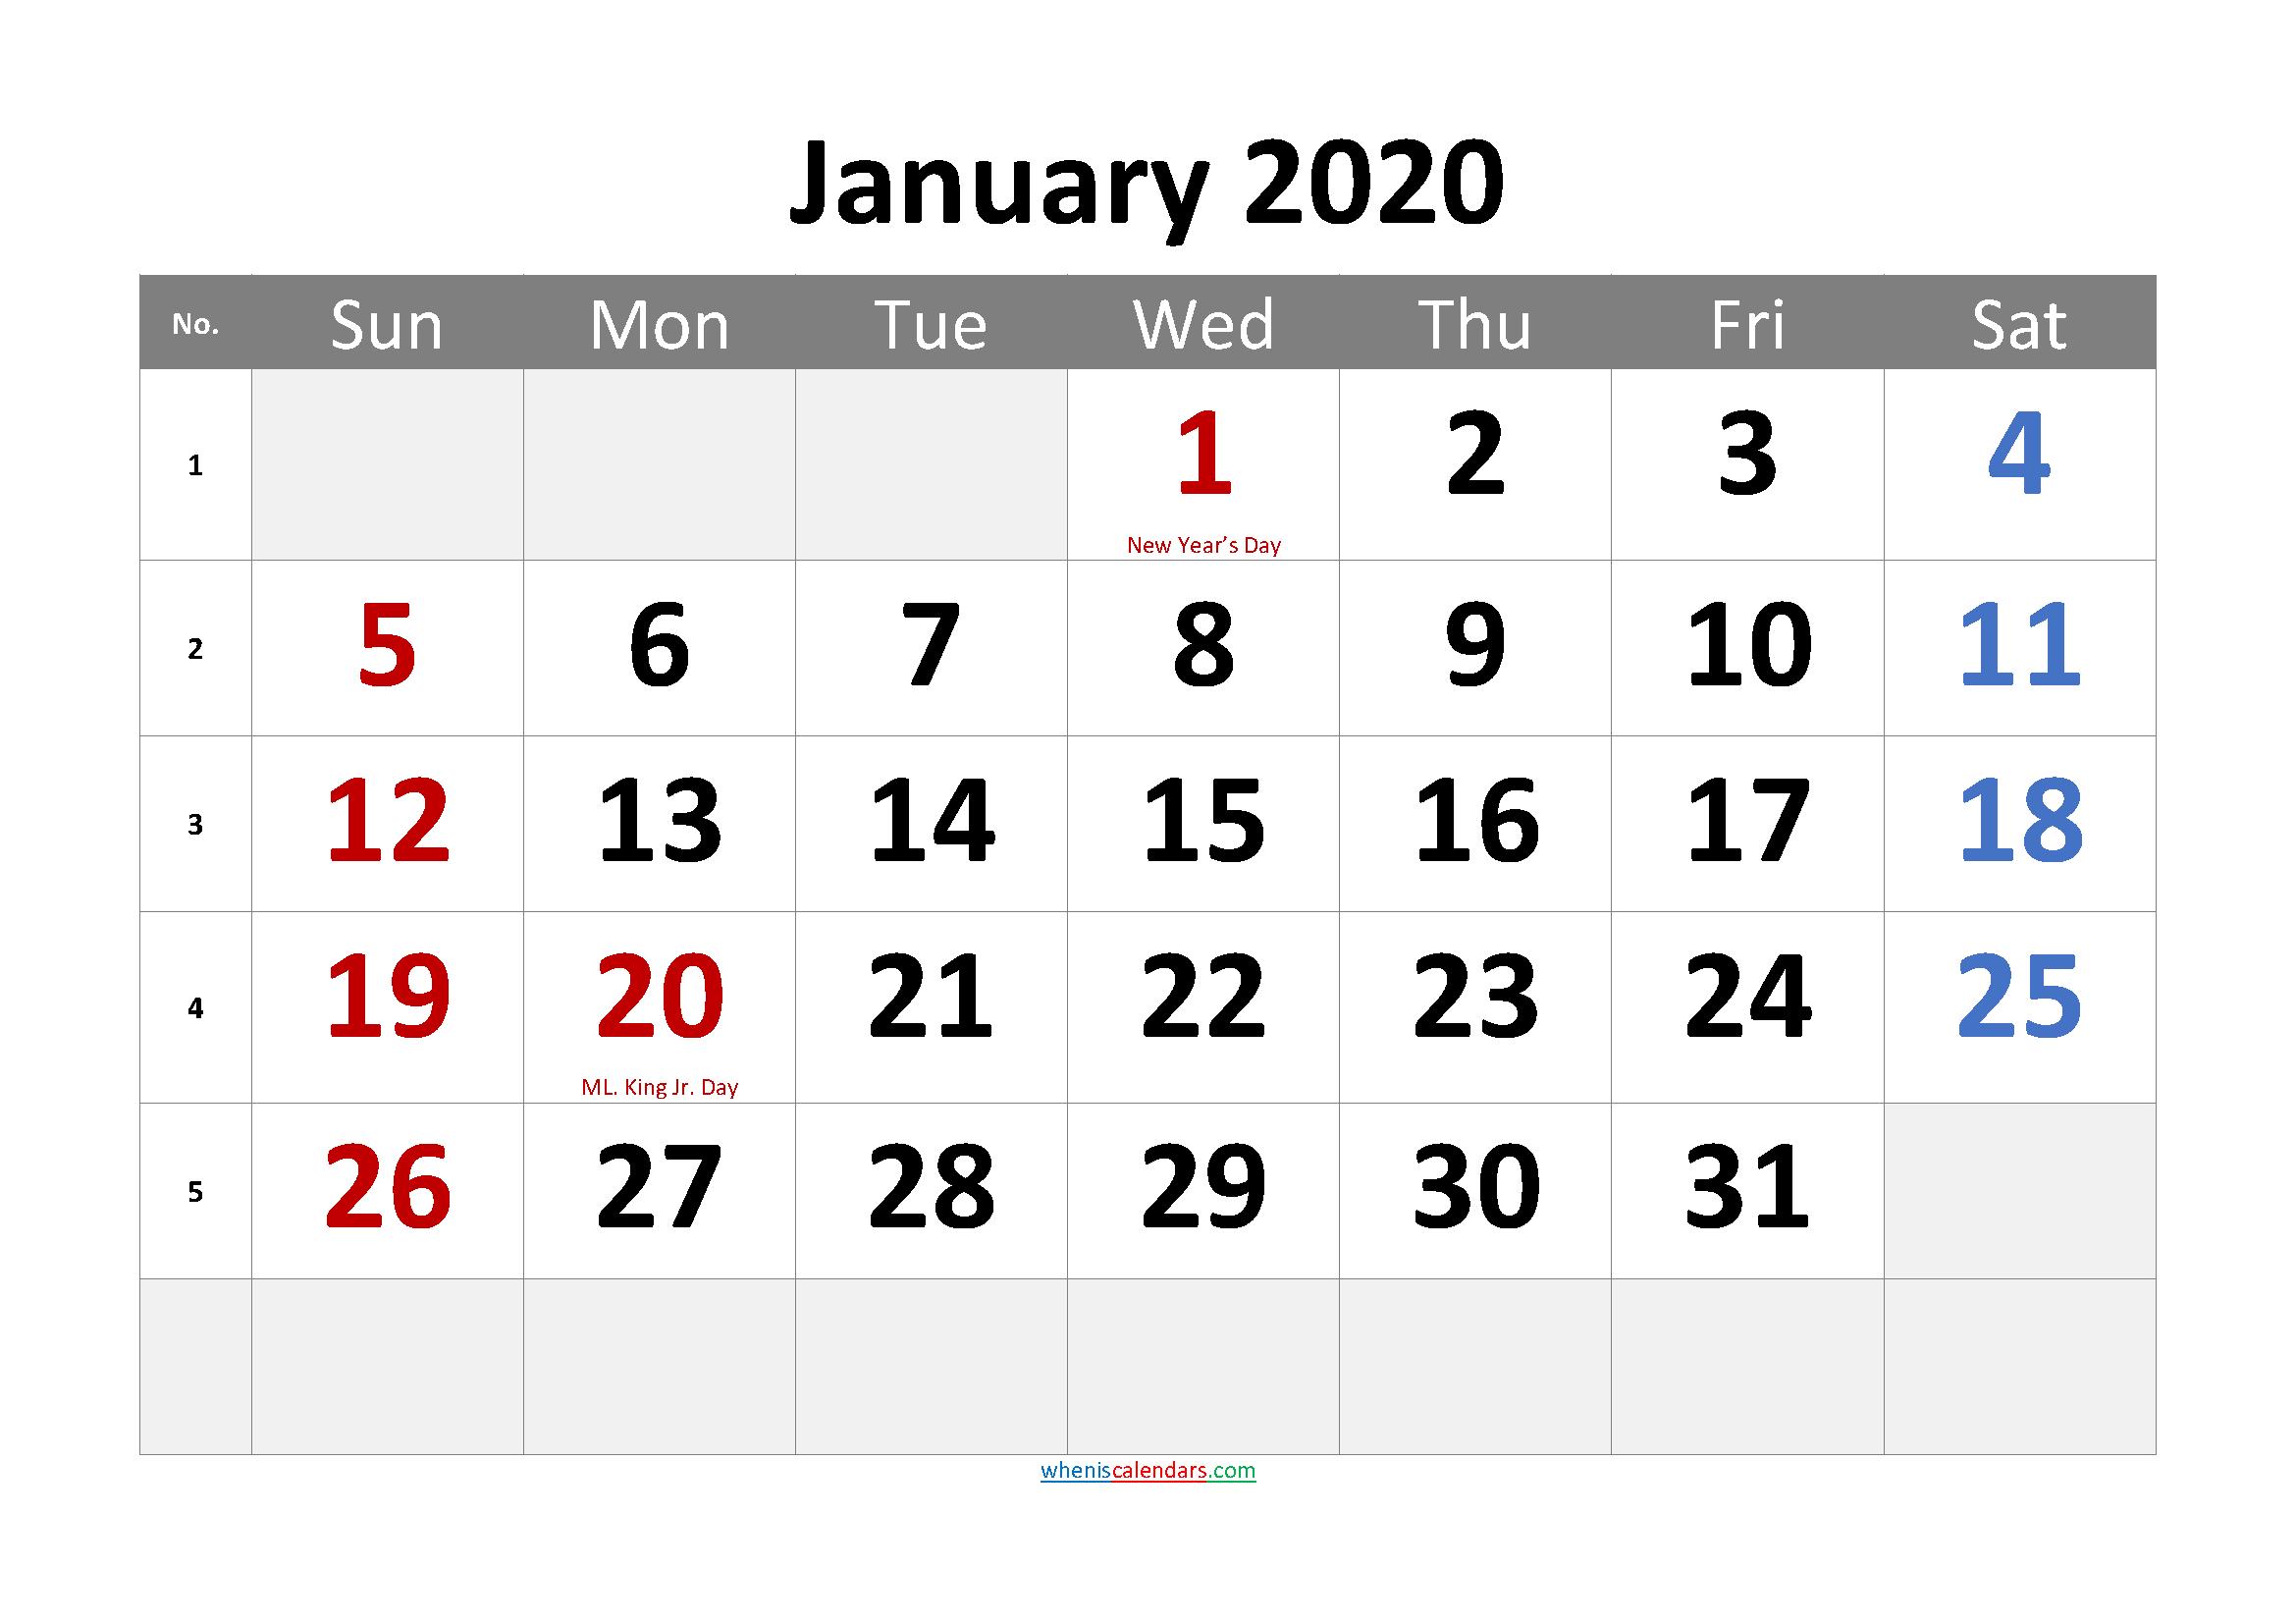 Free Printable JANUARY 2020 Calendar with Holidays